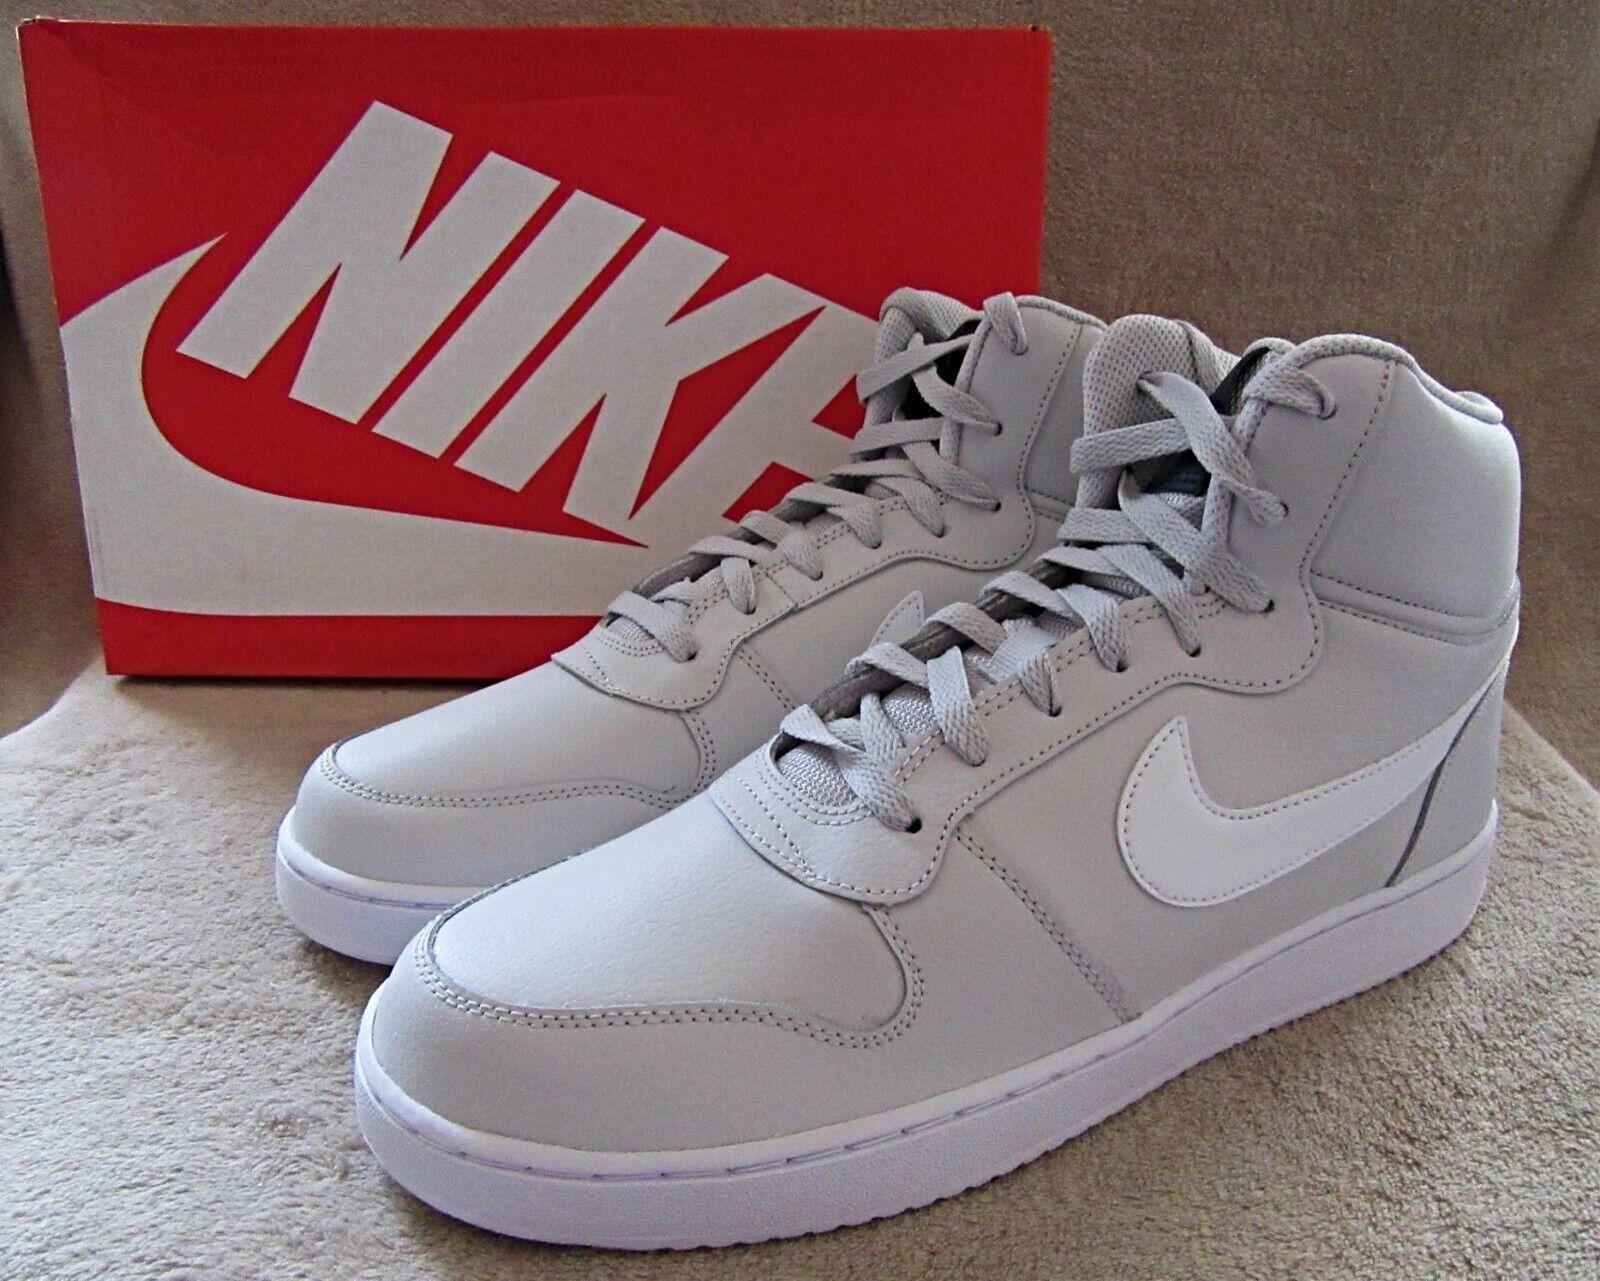 NIKE Ebernon AQ1773 003 Mid Grey White Basketball shoes US 11 M NWB